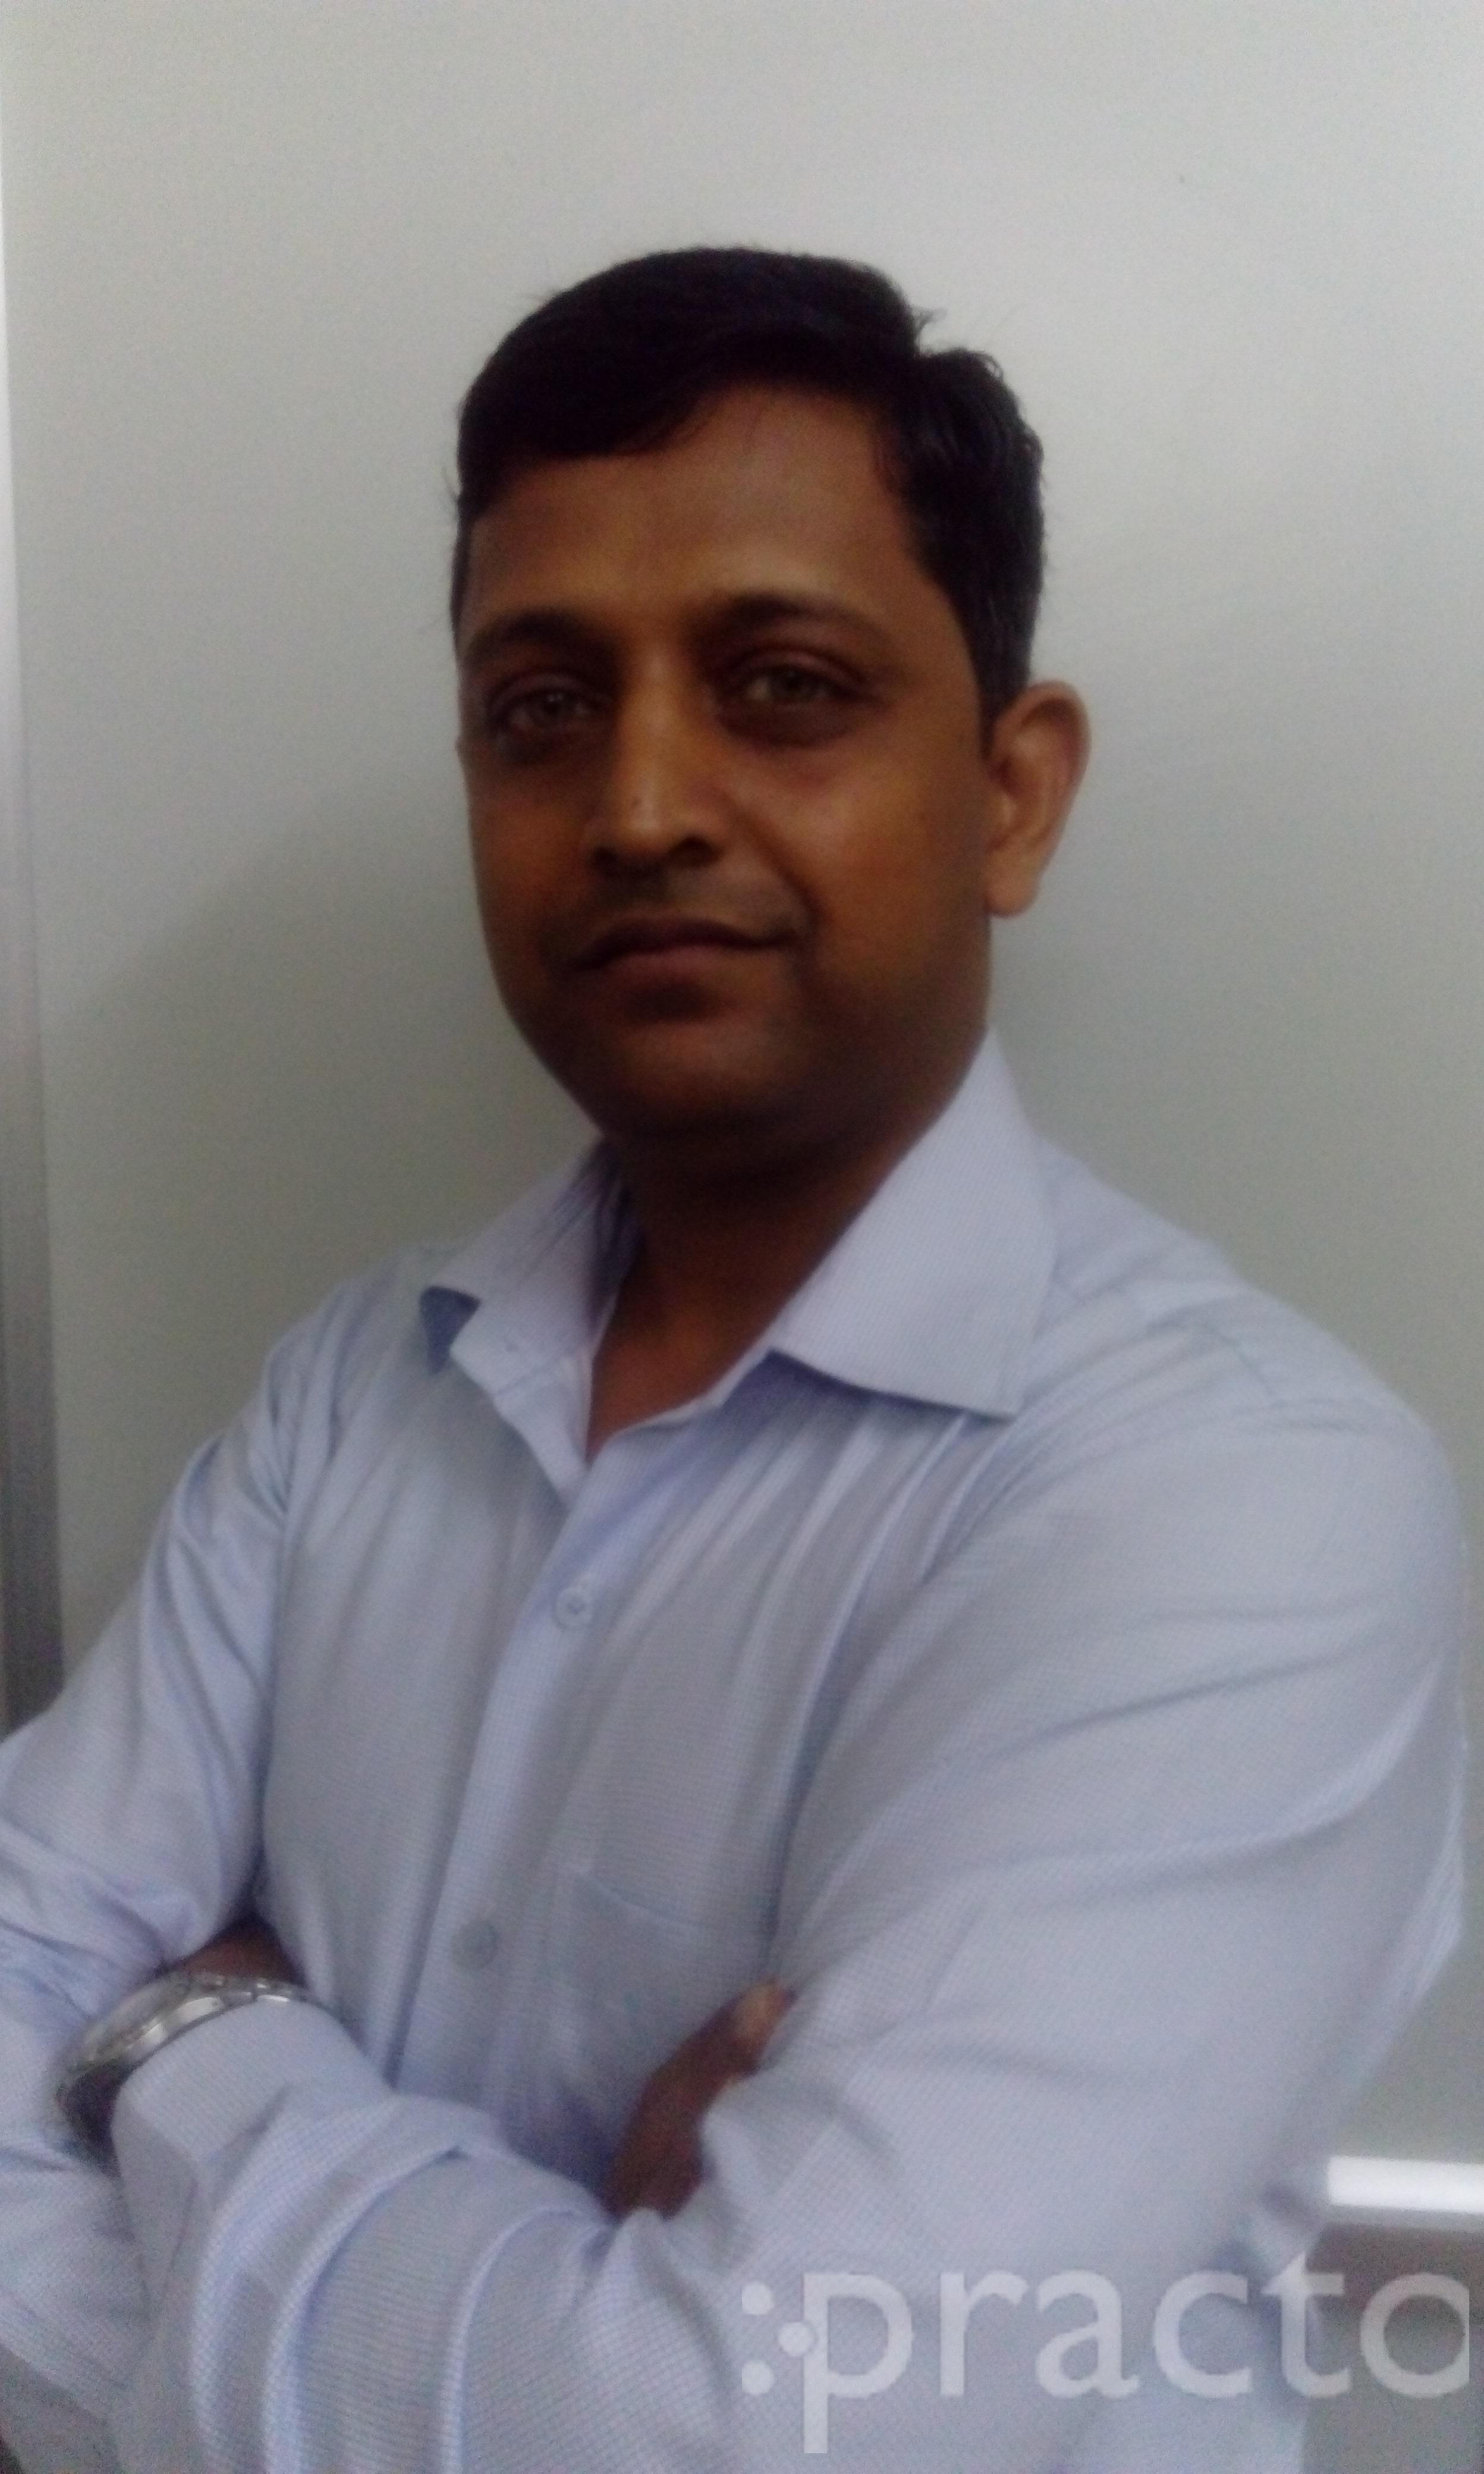 Dr. Manoranjan  Kumar - Head and Neck Surgeon